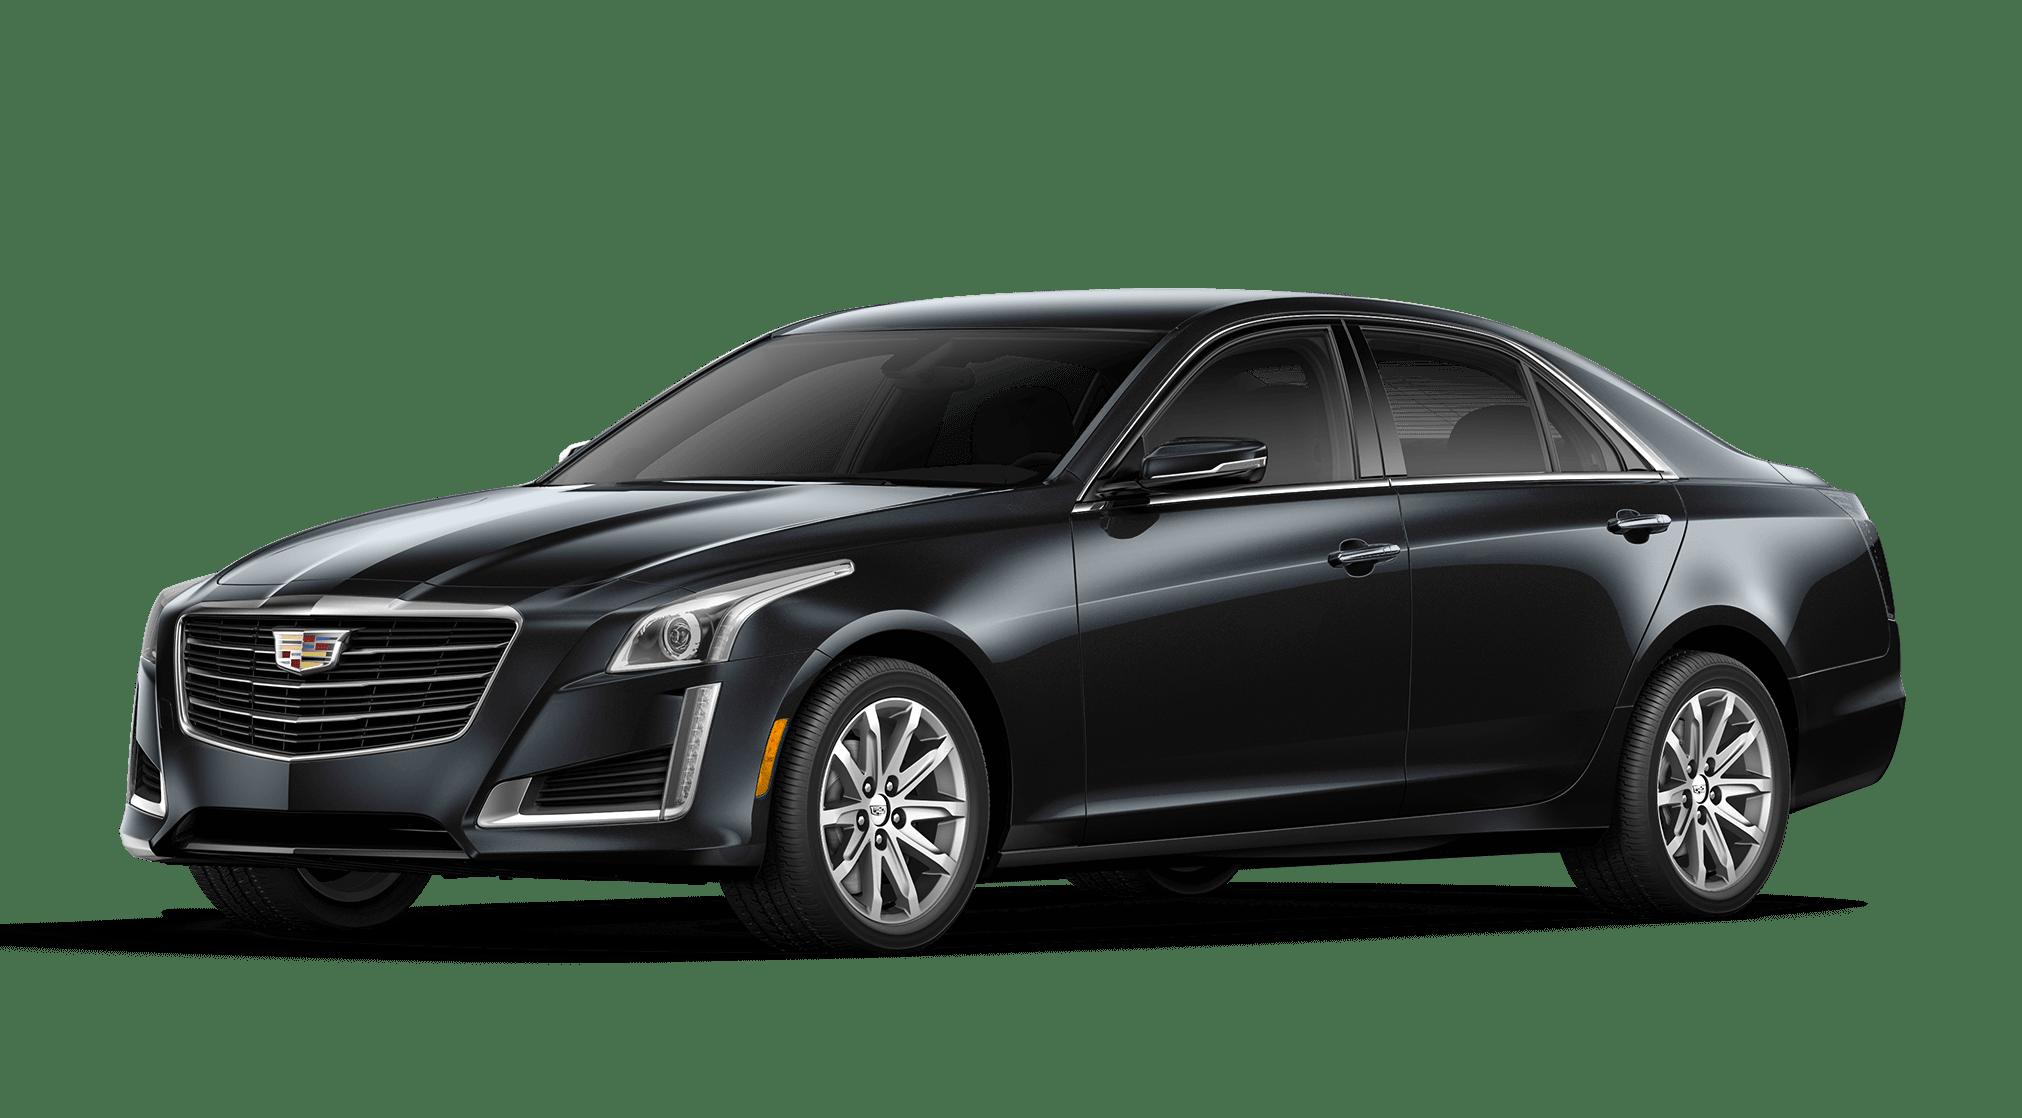 Phantom Grey Cadillac CTS